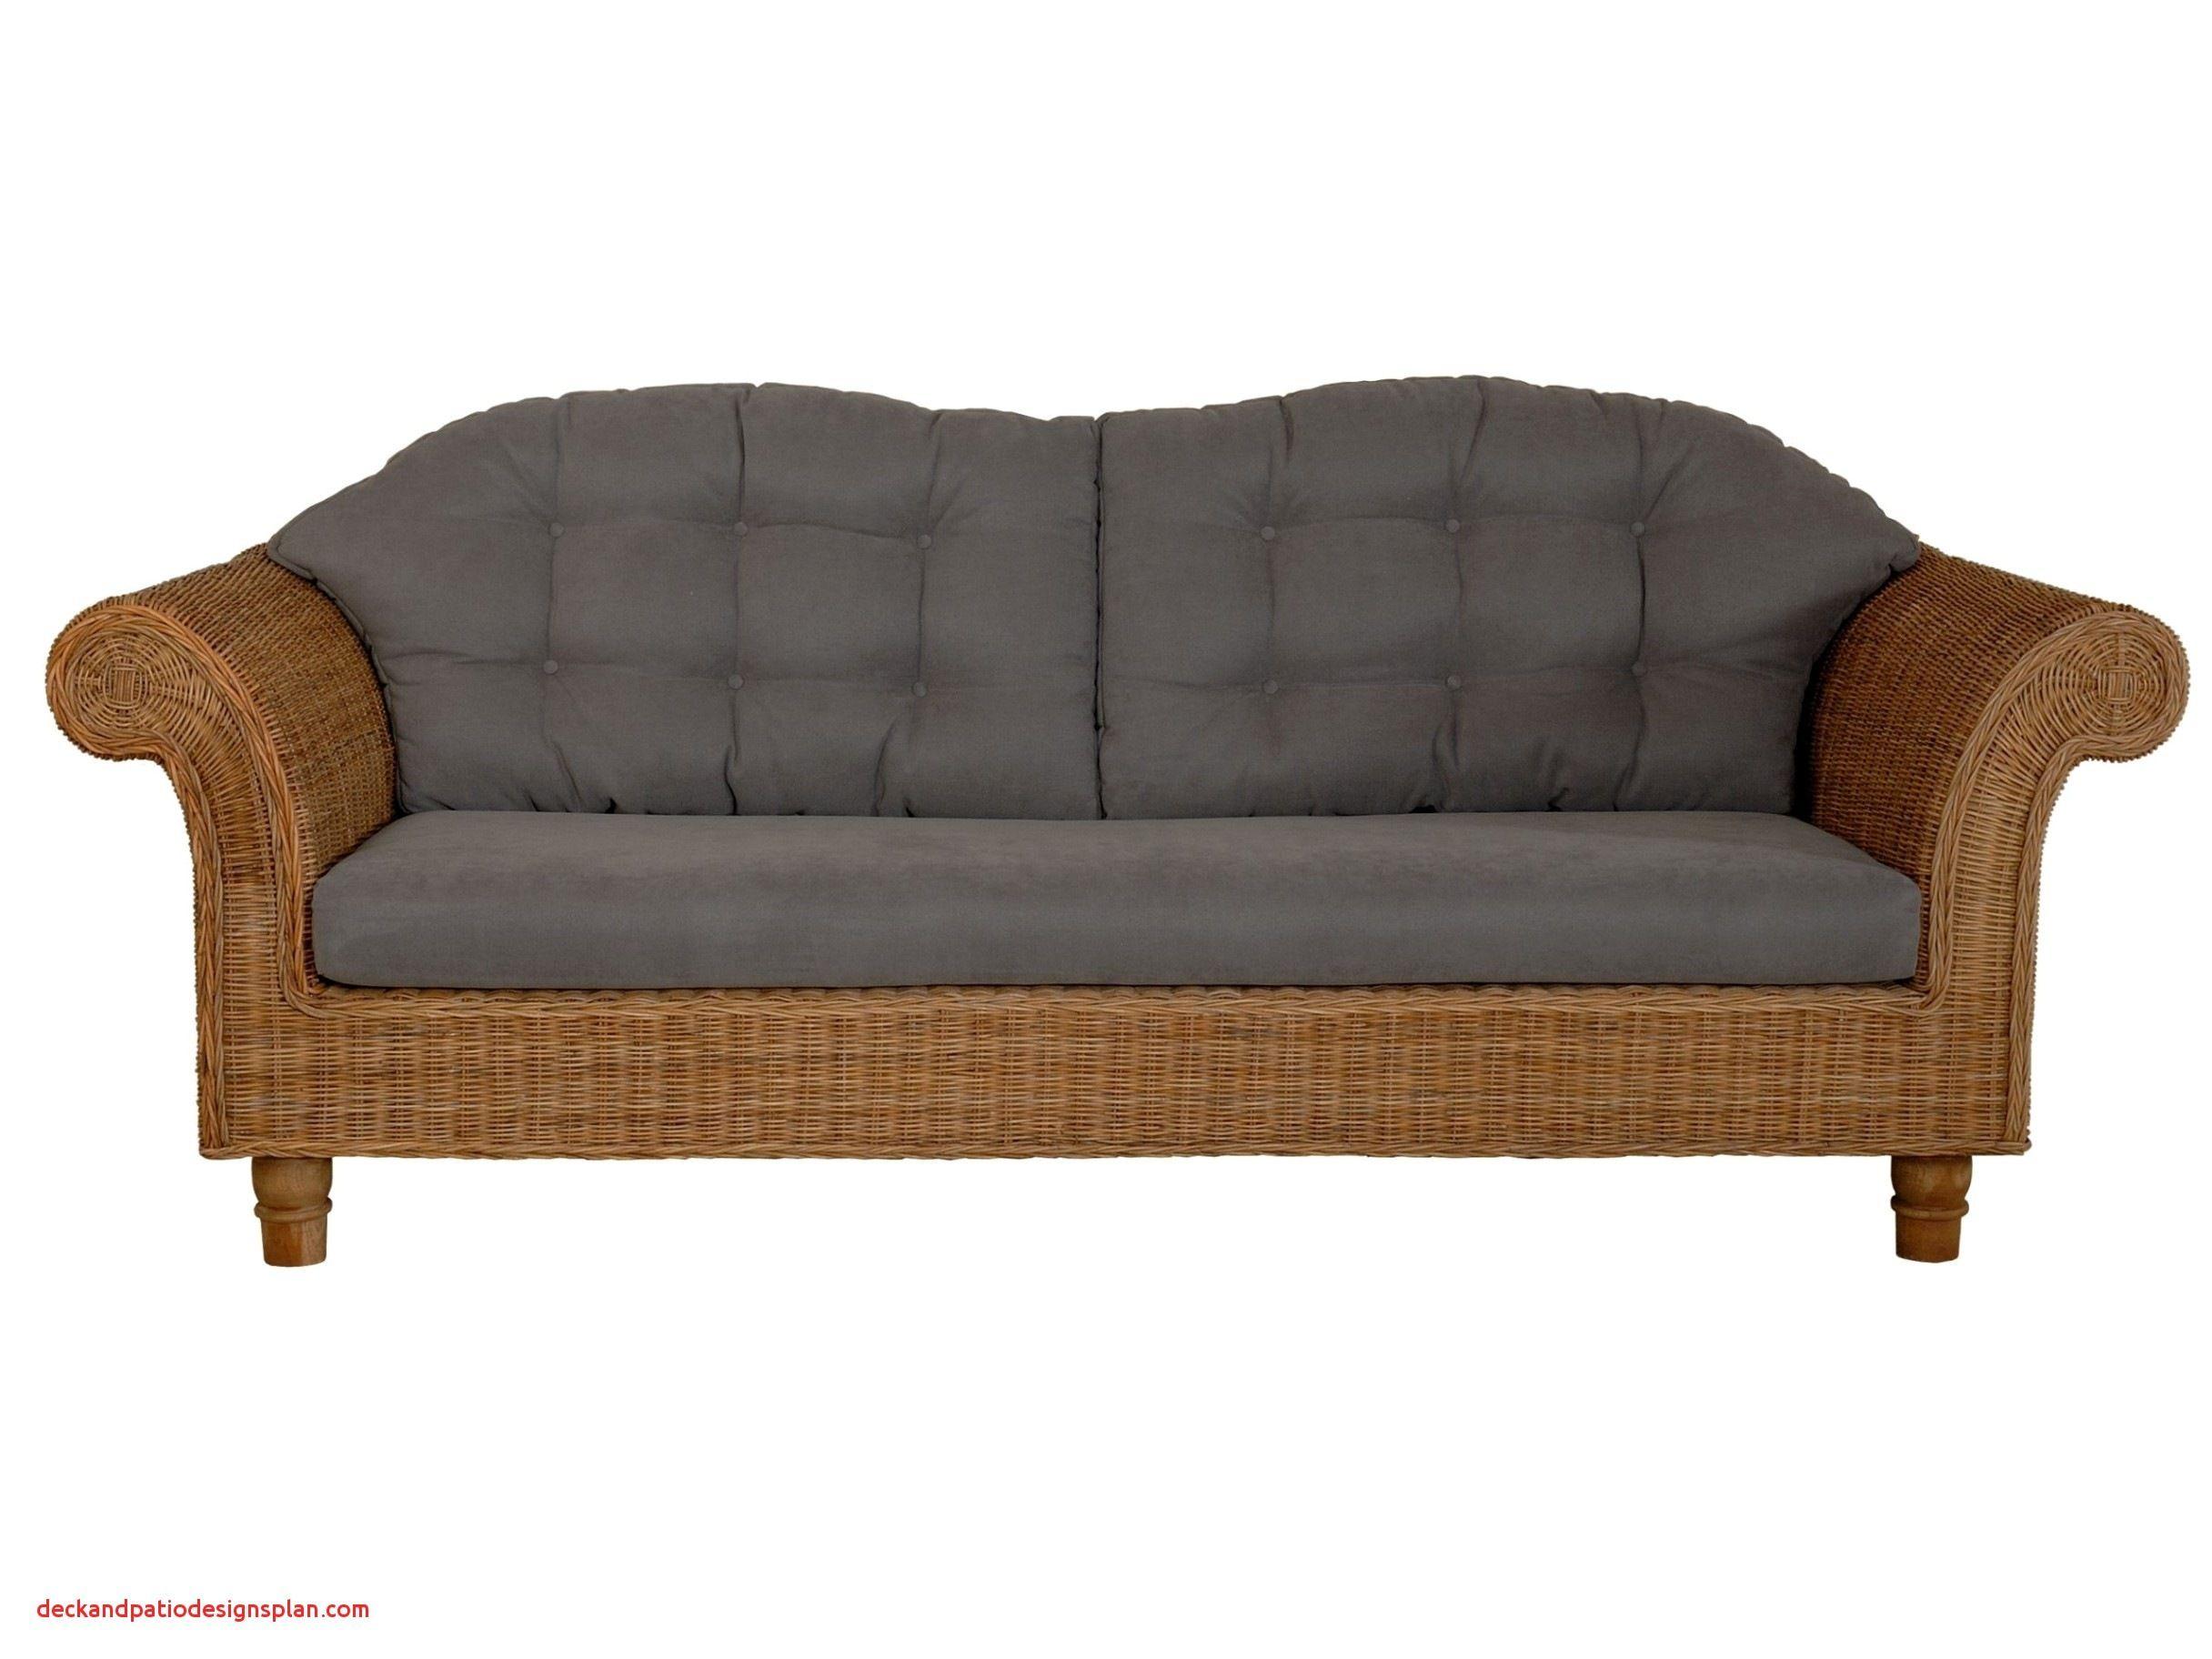 26 Neues Sofa Cm Bett Couch möbel, Sofa, Big sofa mit